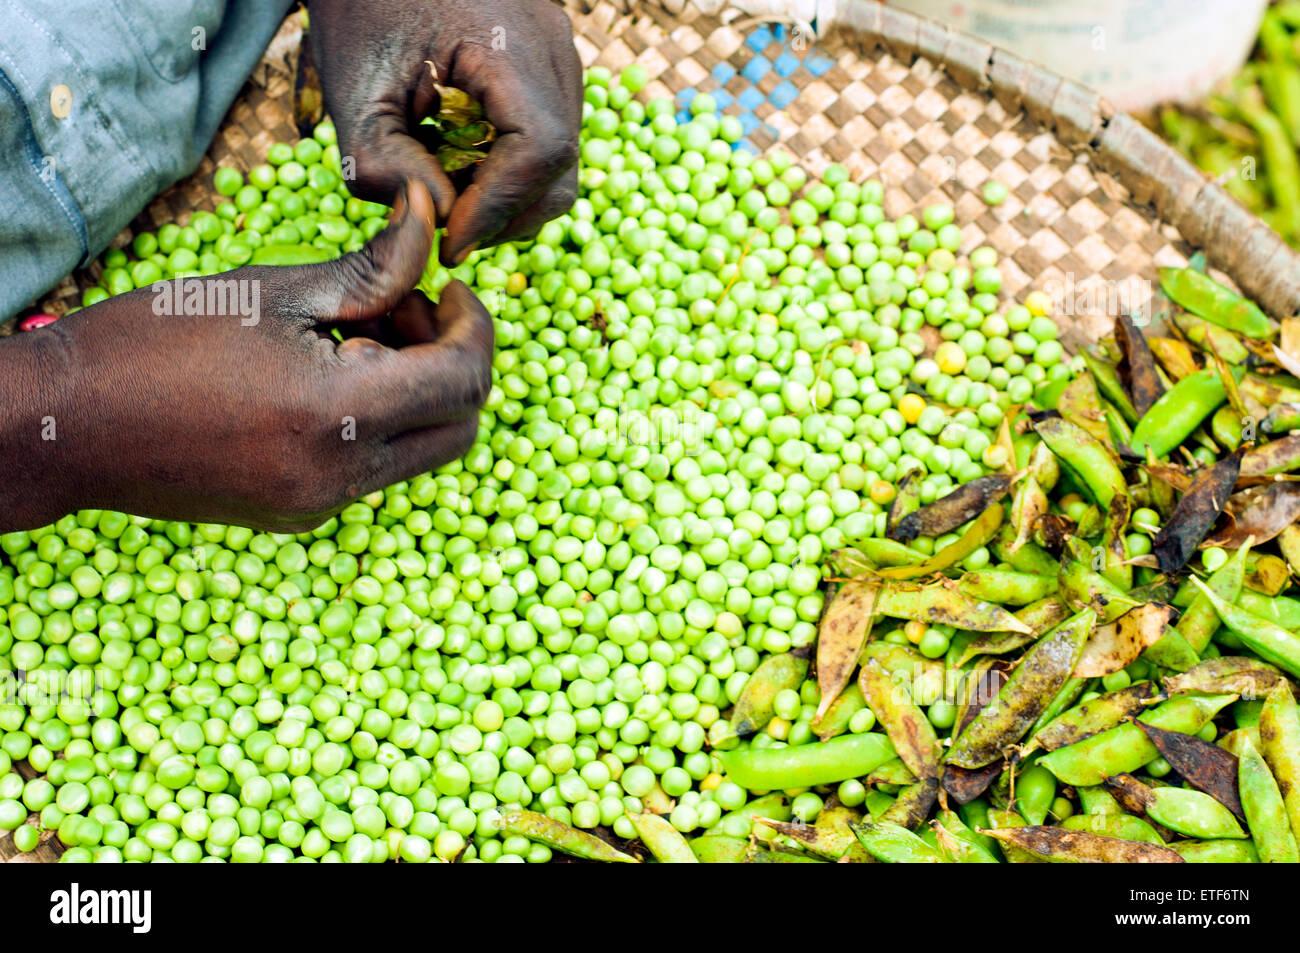 Man shelling peas, Nyamirambo, Kigali, Rwanda - Stock Image